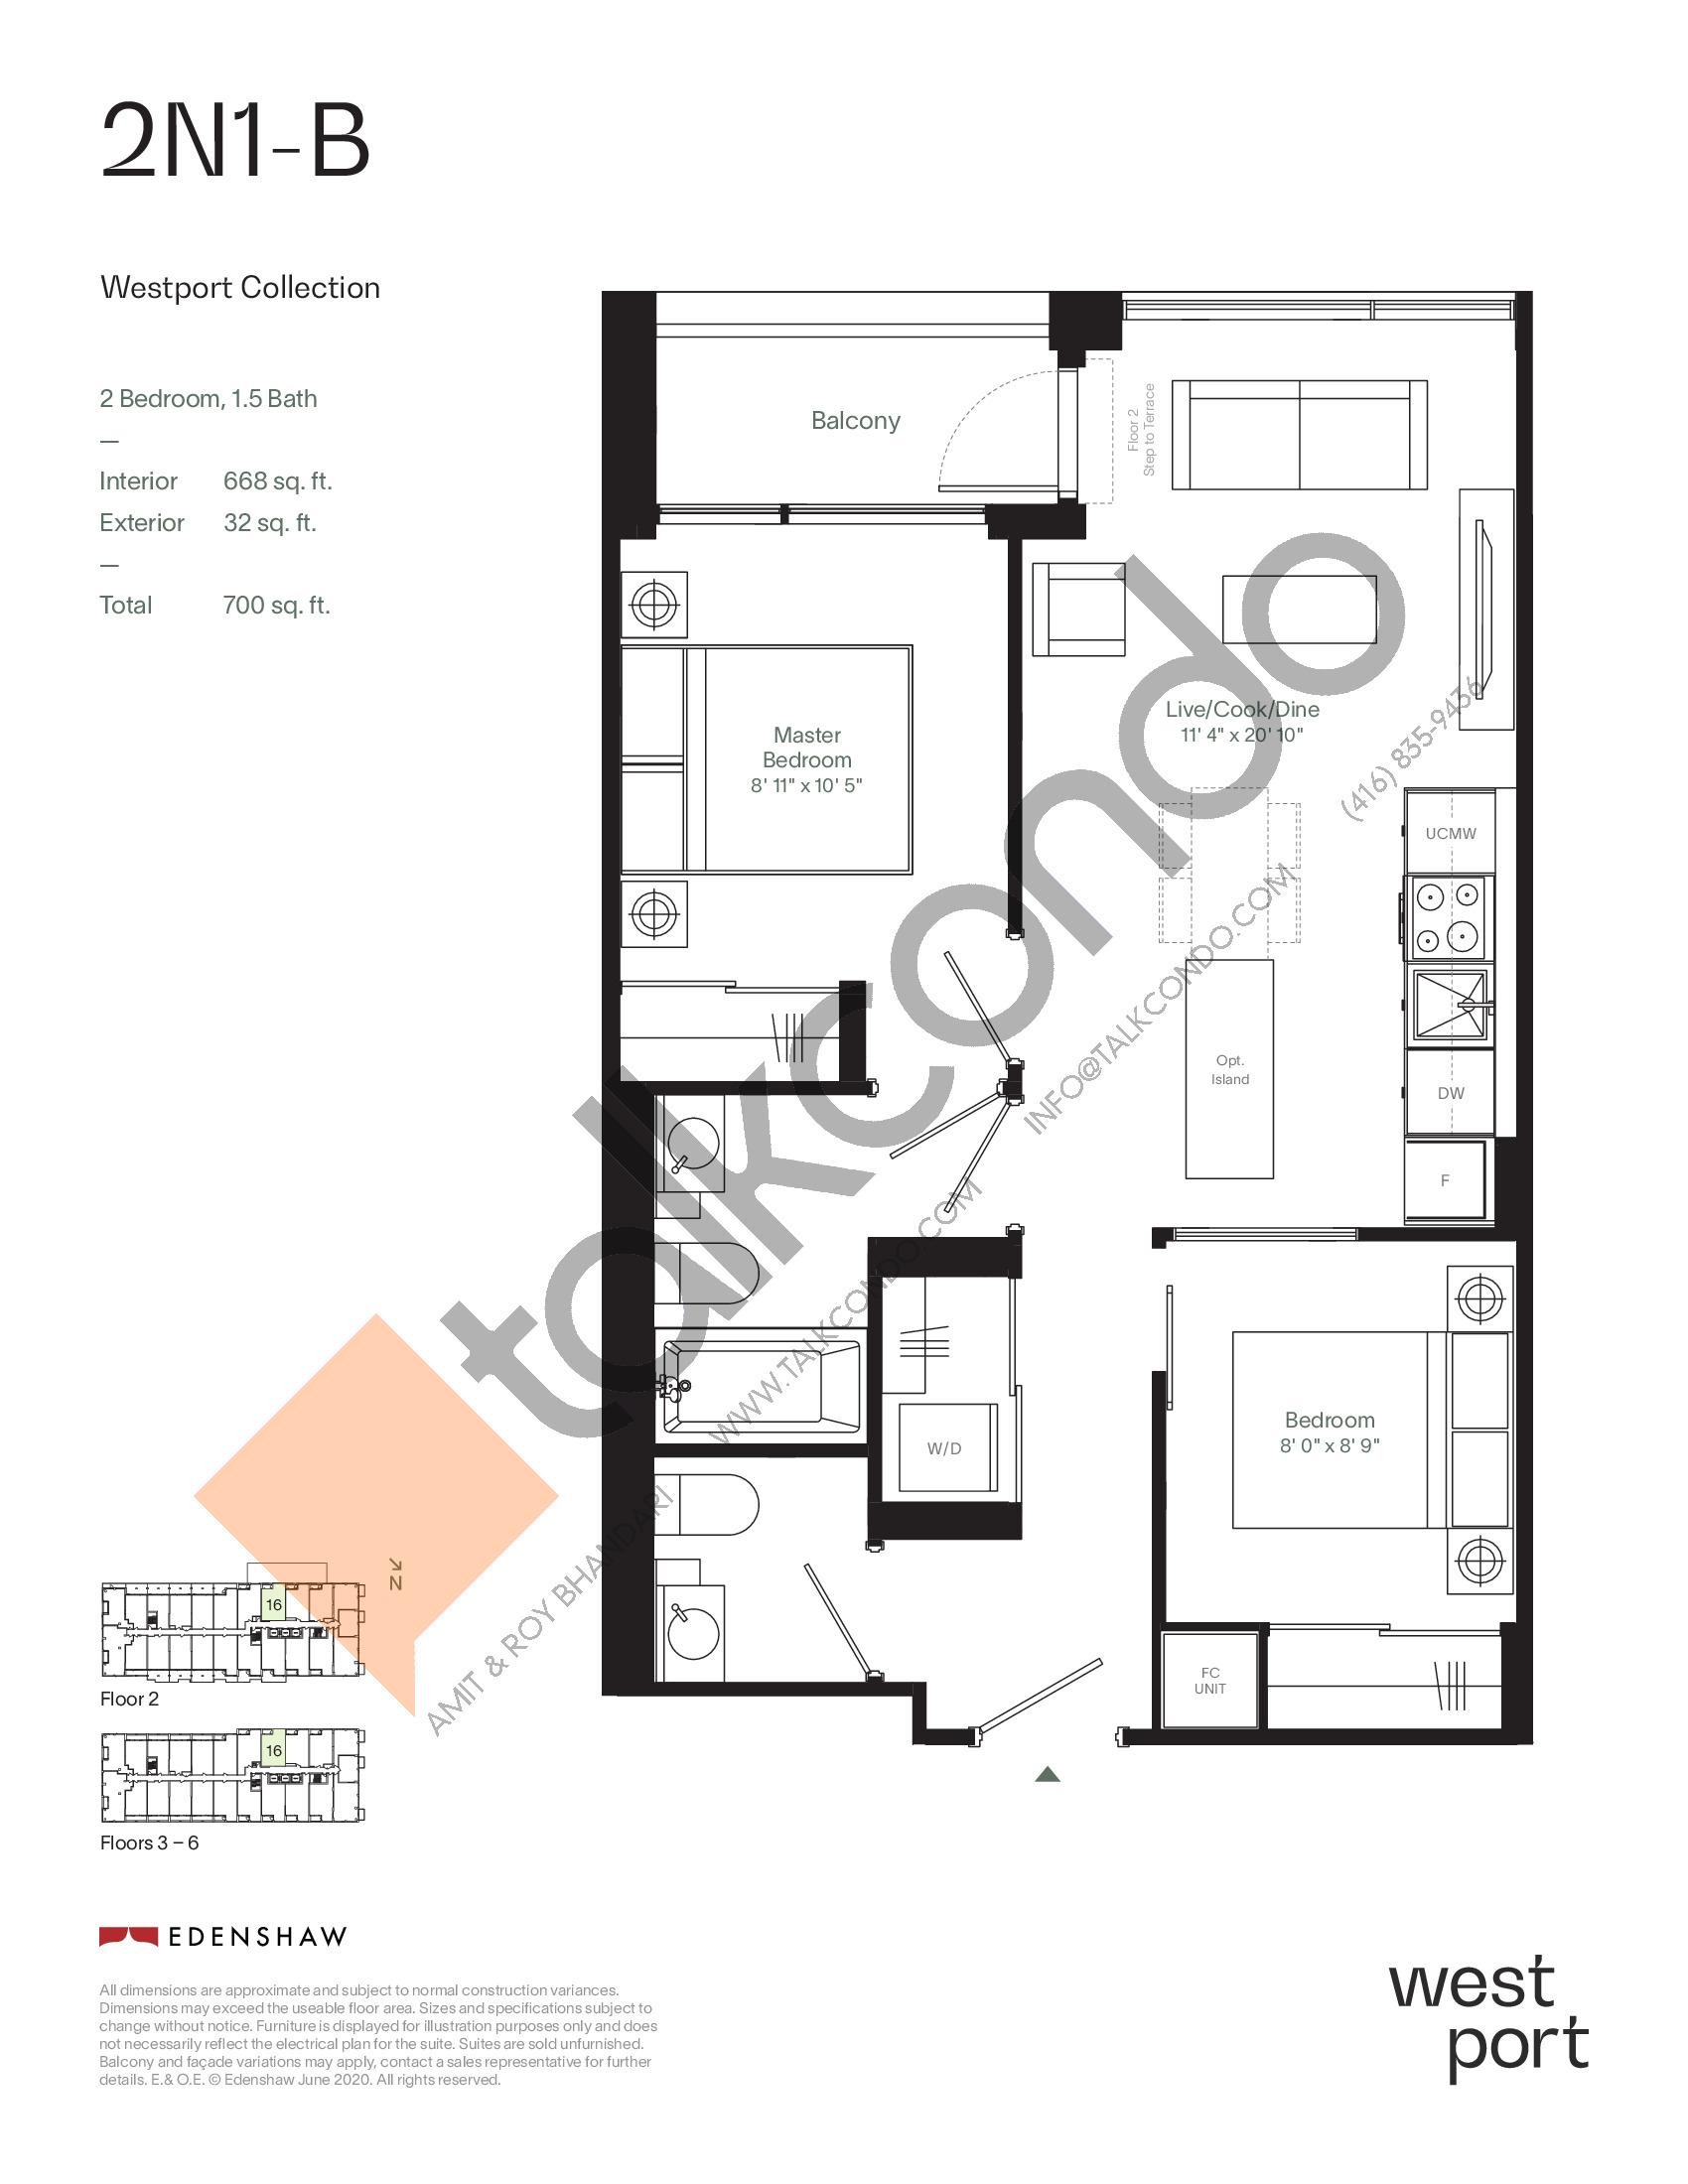 2N1-B - Westport Collection Floor Plan at Westport Condos - 668 sq.ft